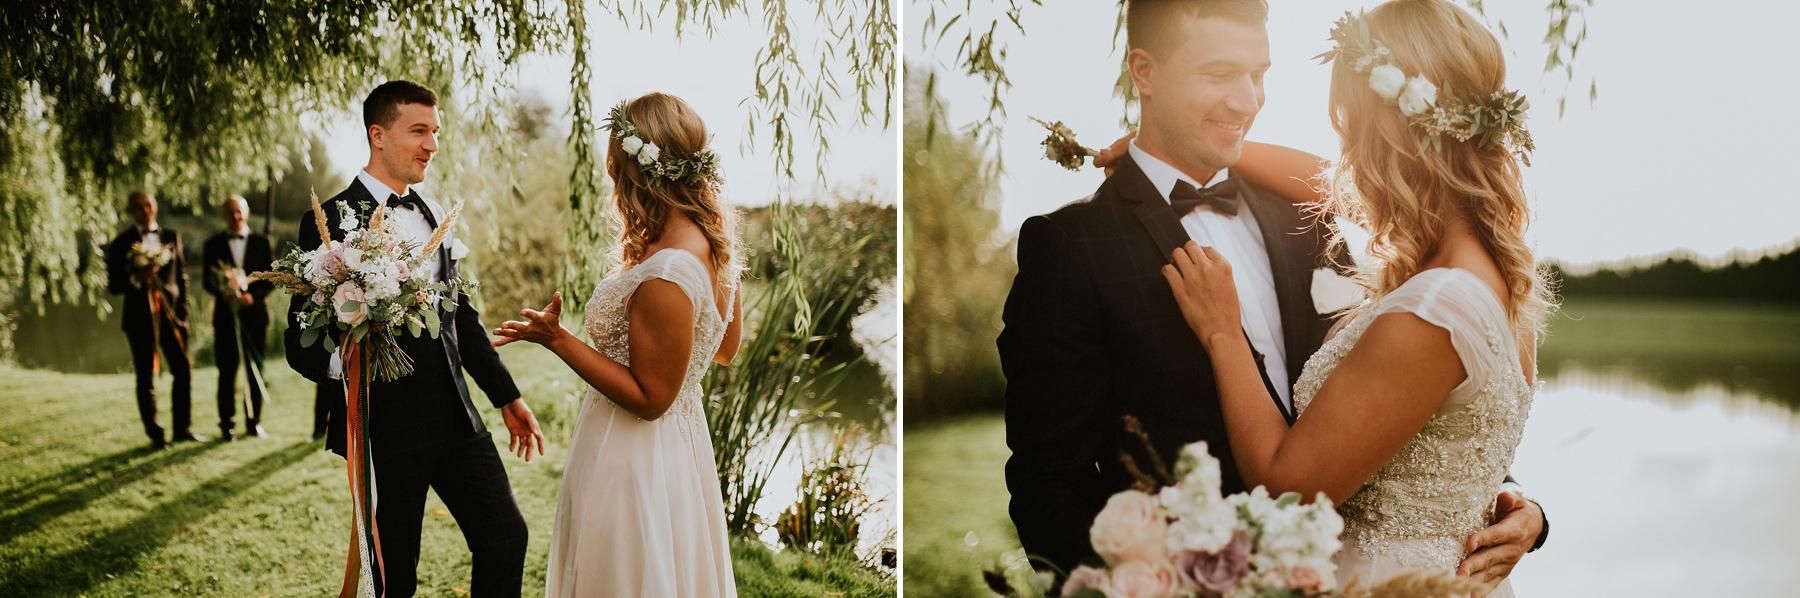 zamojskie rancho debry wesele